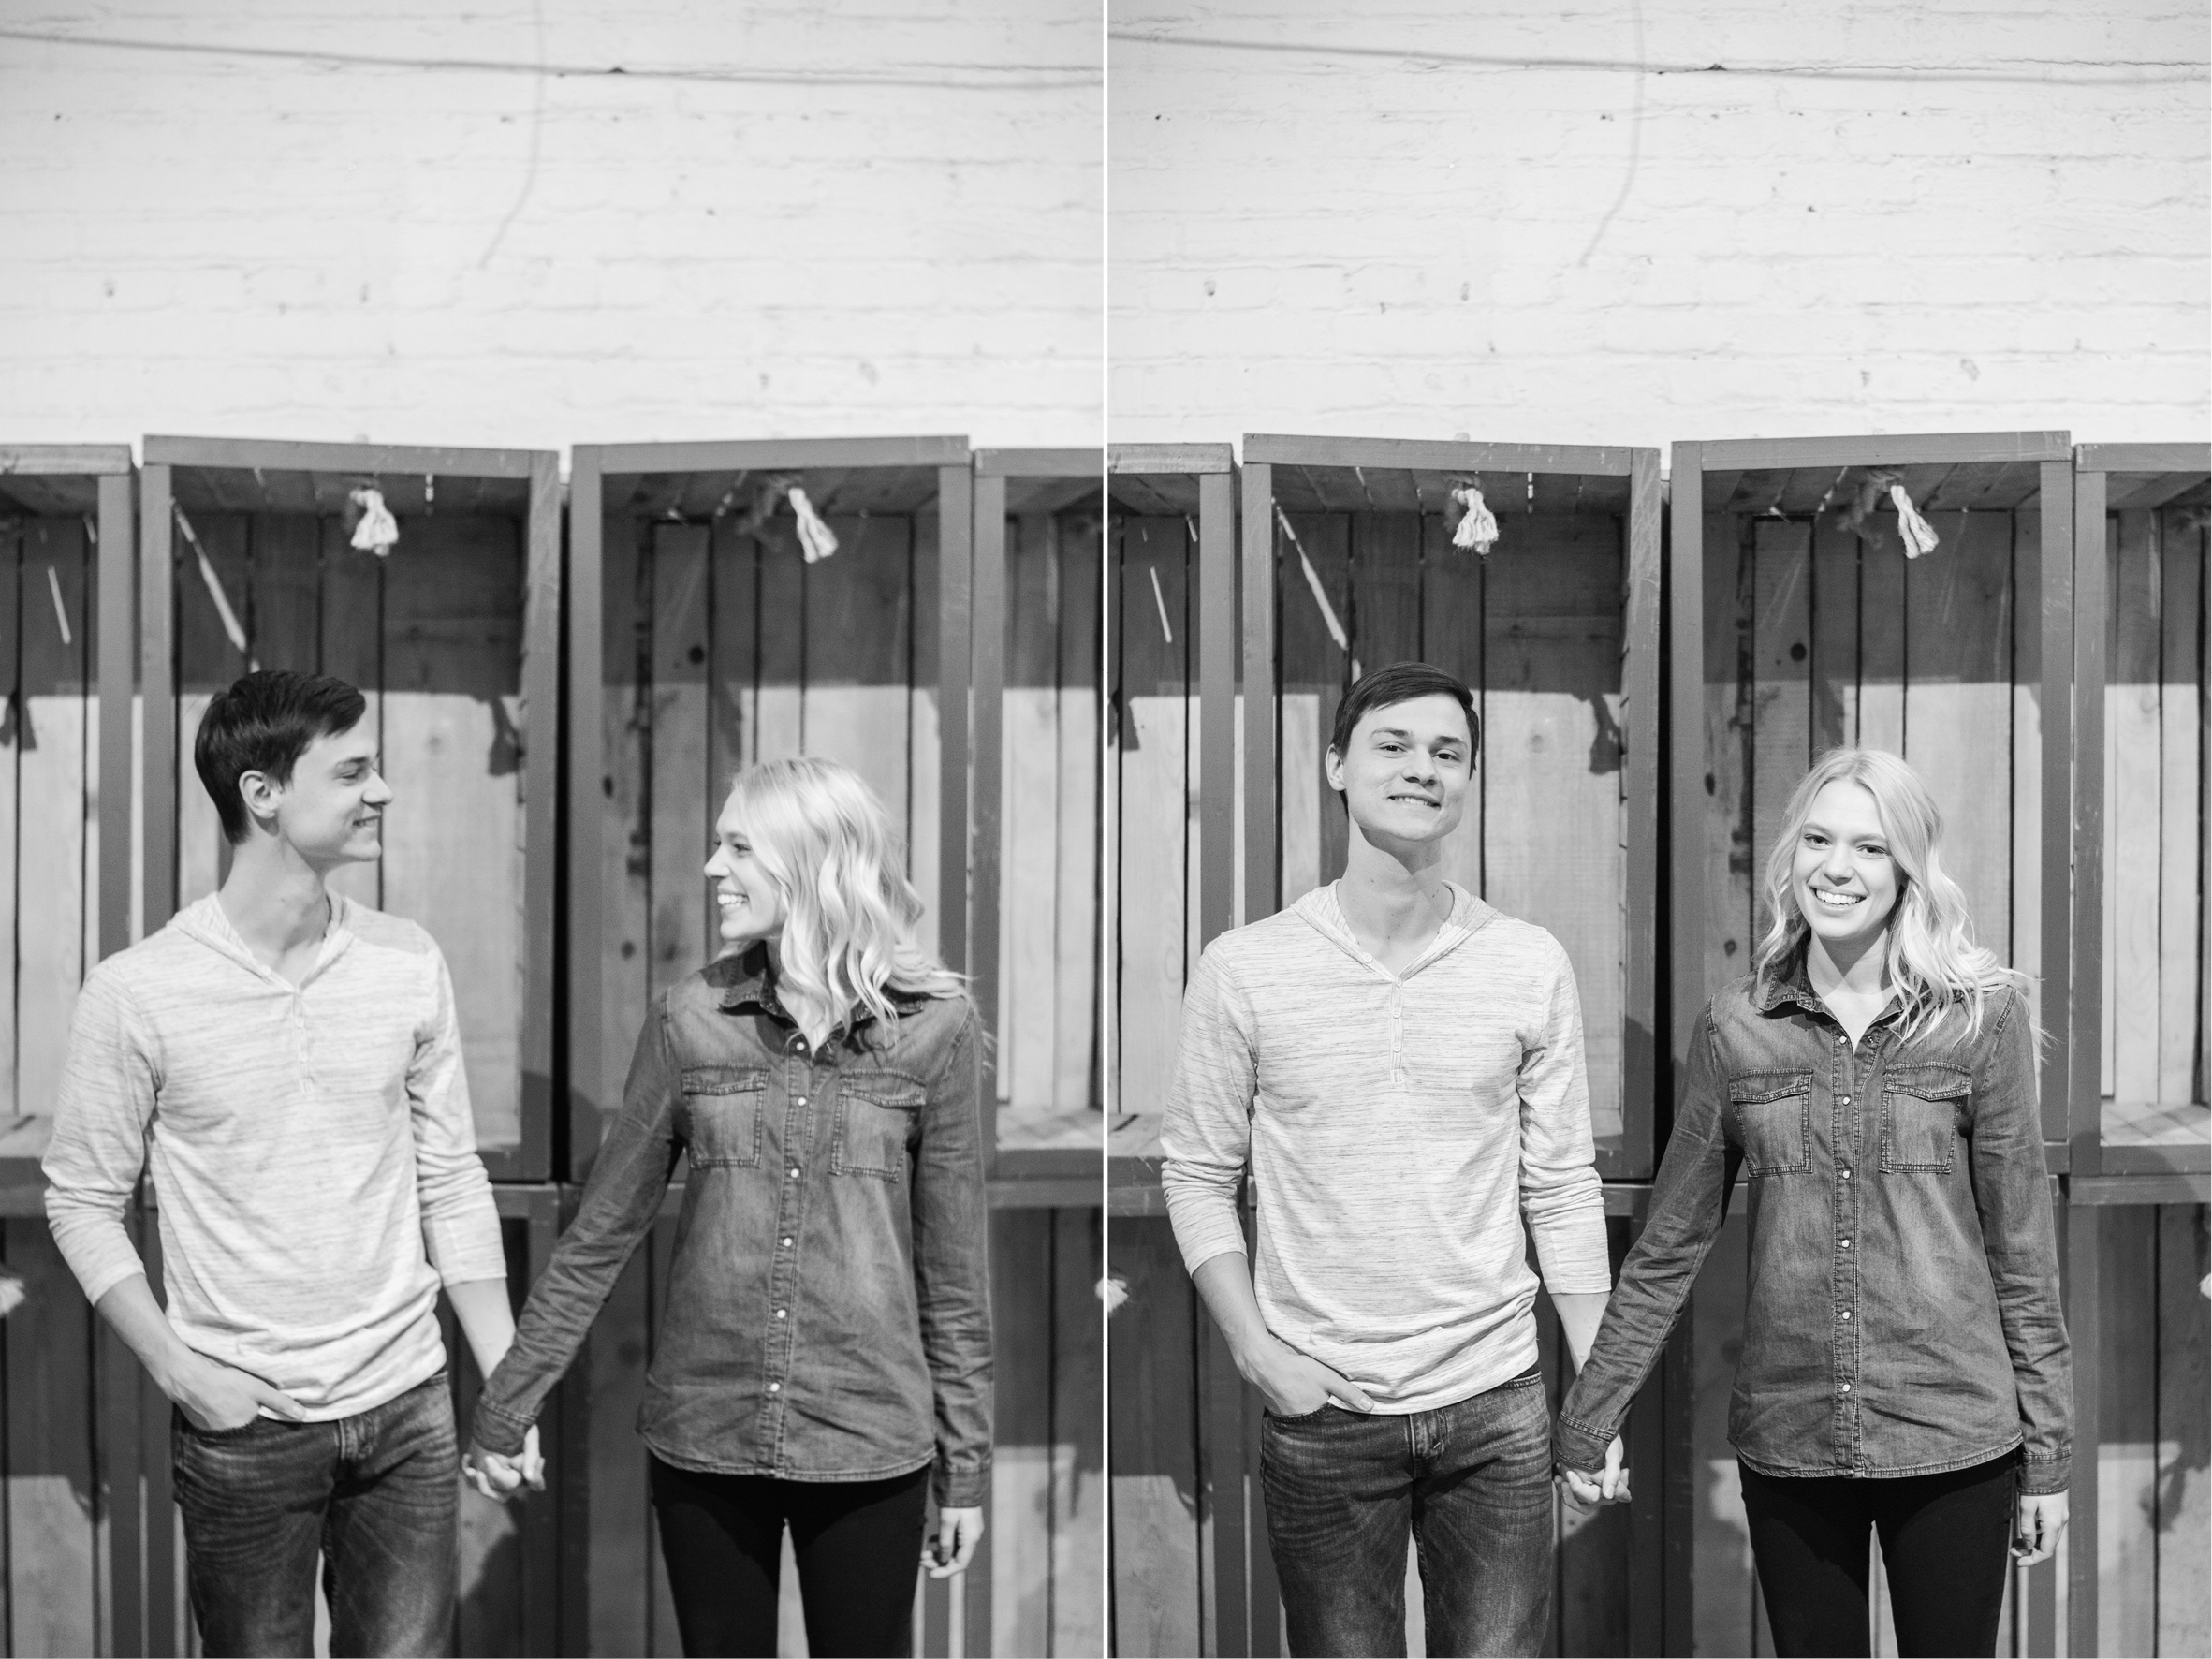 Bronwyn Alyson - Caitlin & Athan Couple Maboneng 04.jpg